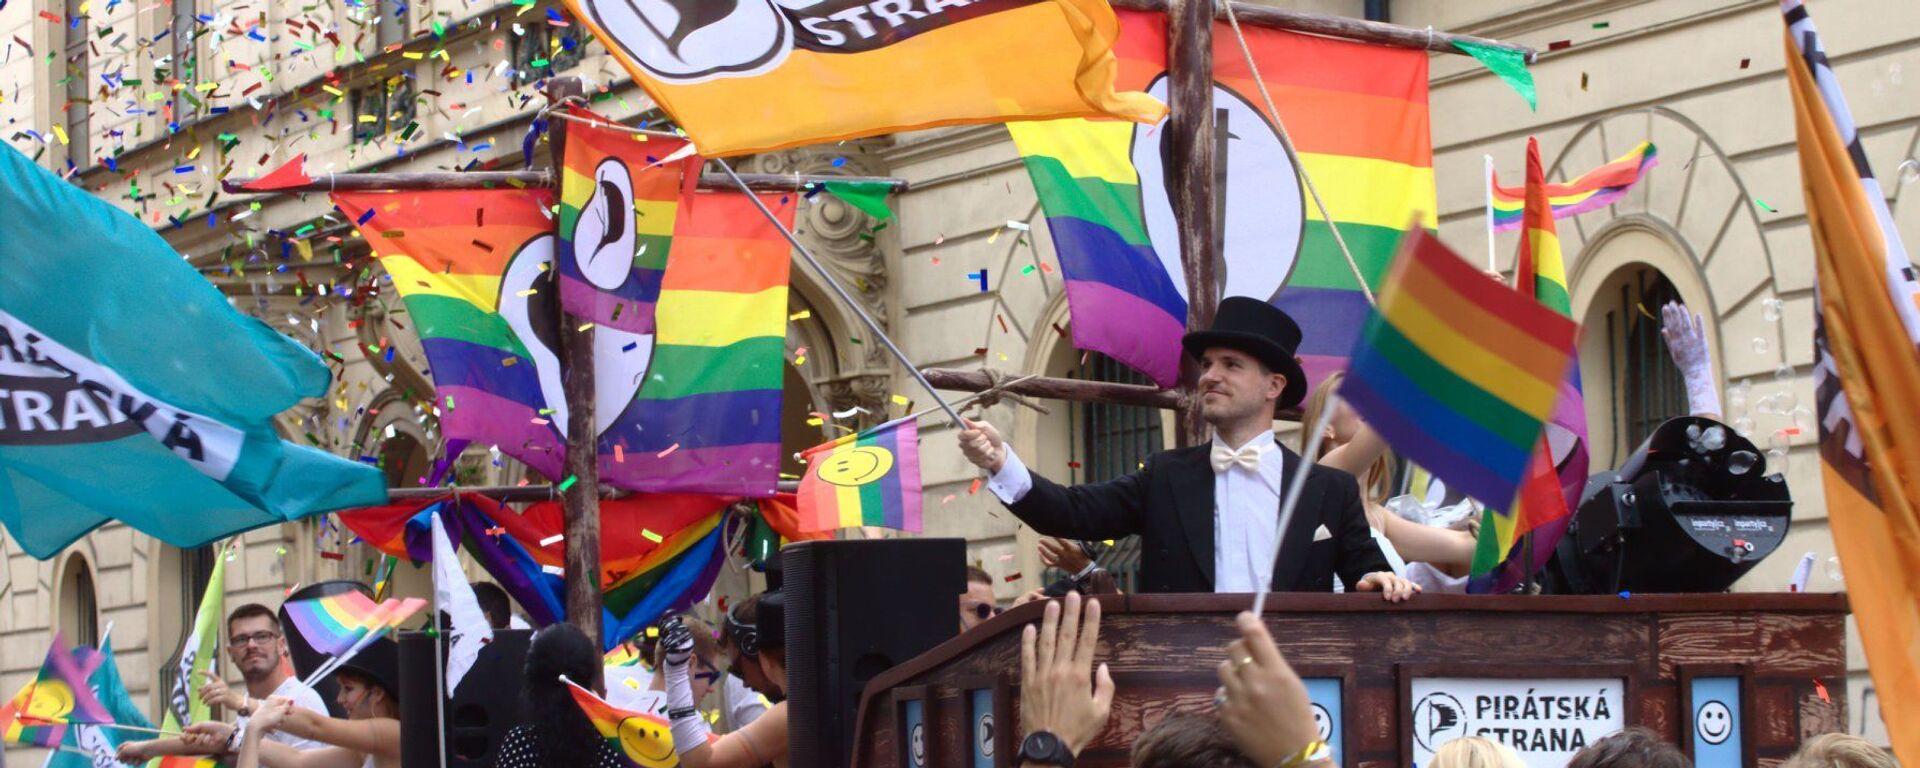 Prague Pride 2020 - Sputnik Česká republika, 1920, 30.04.2021